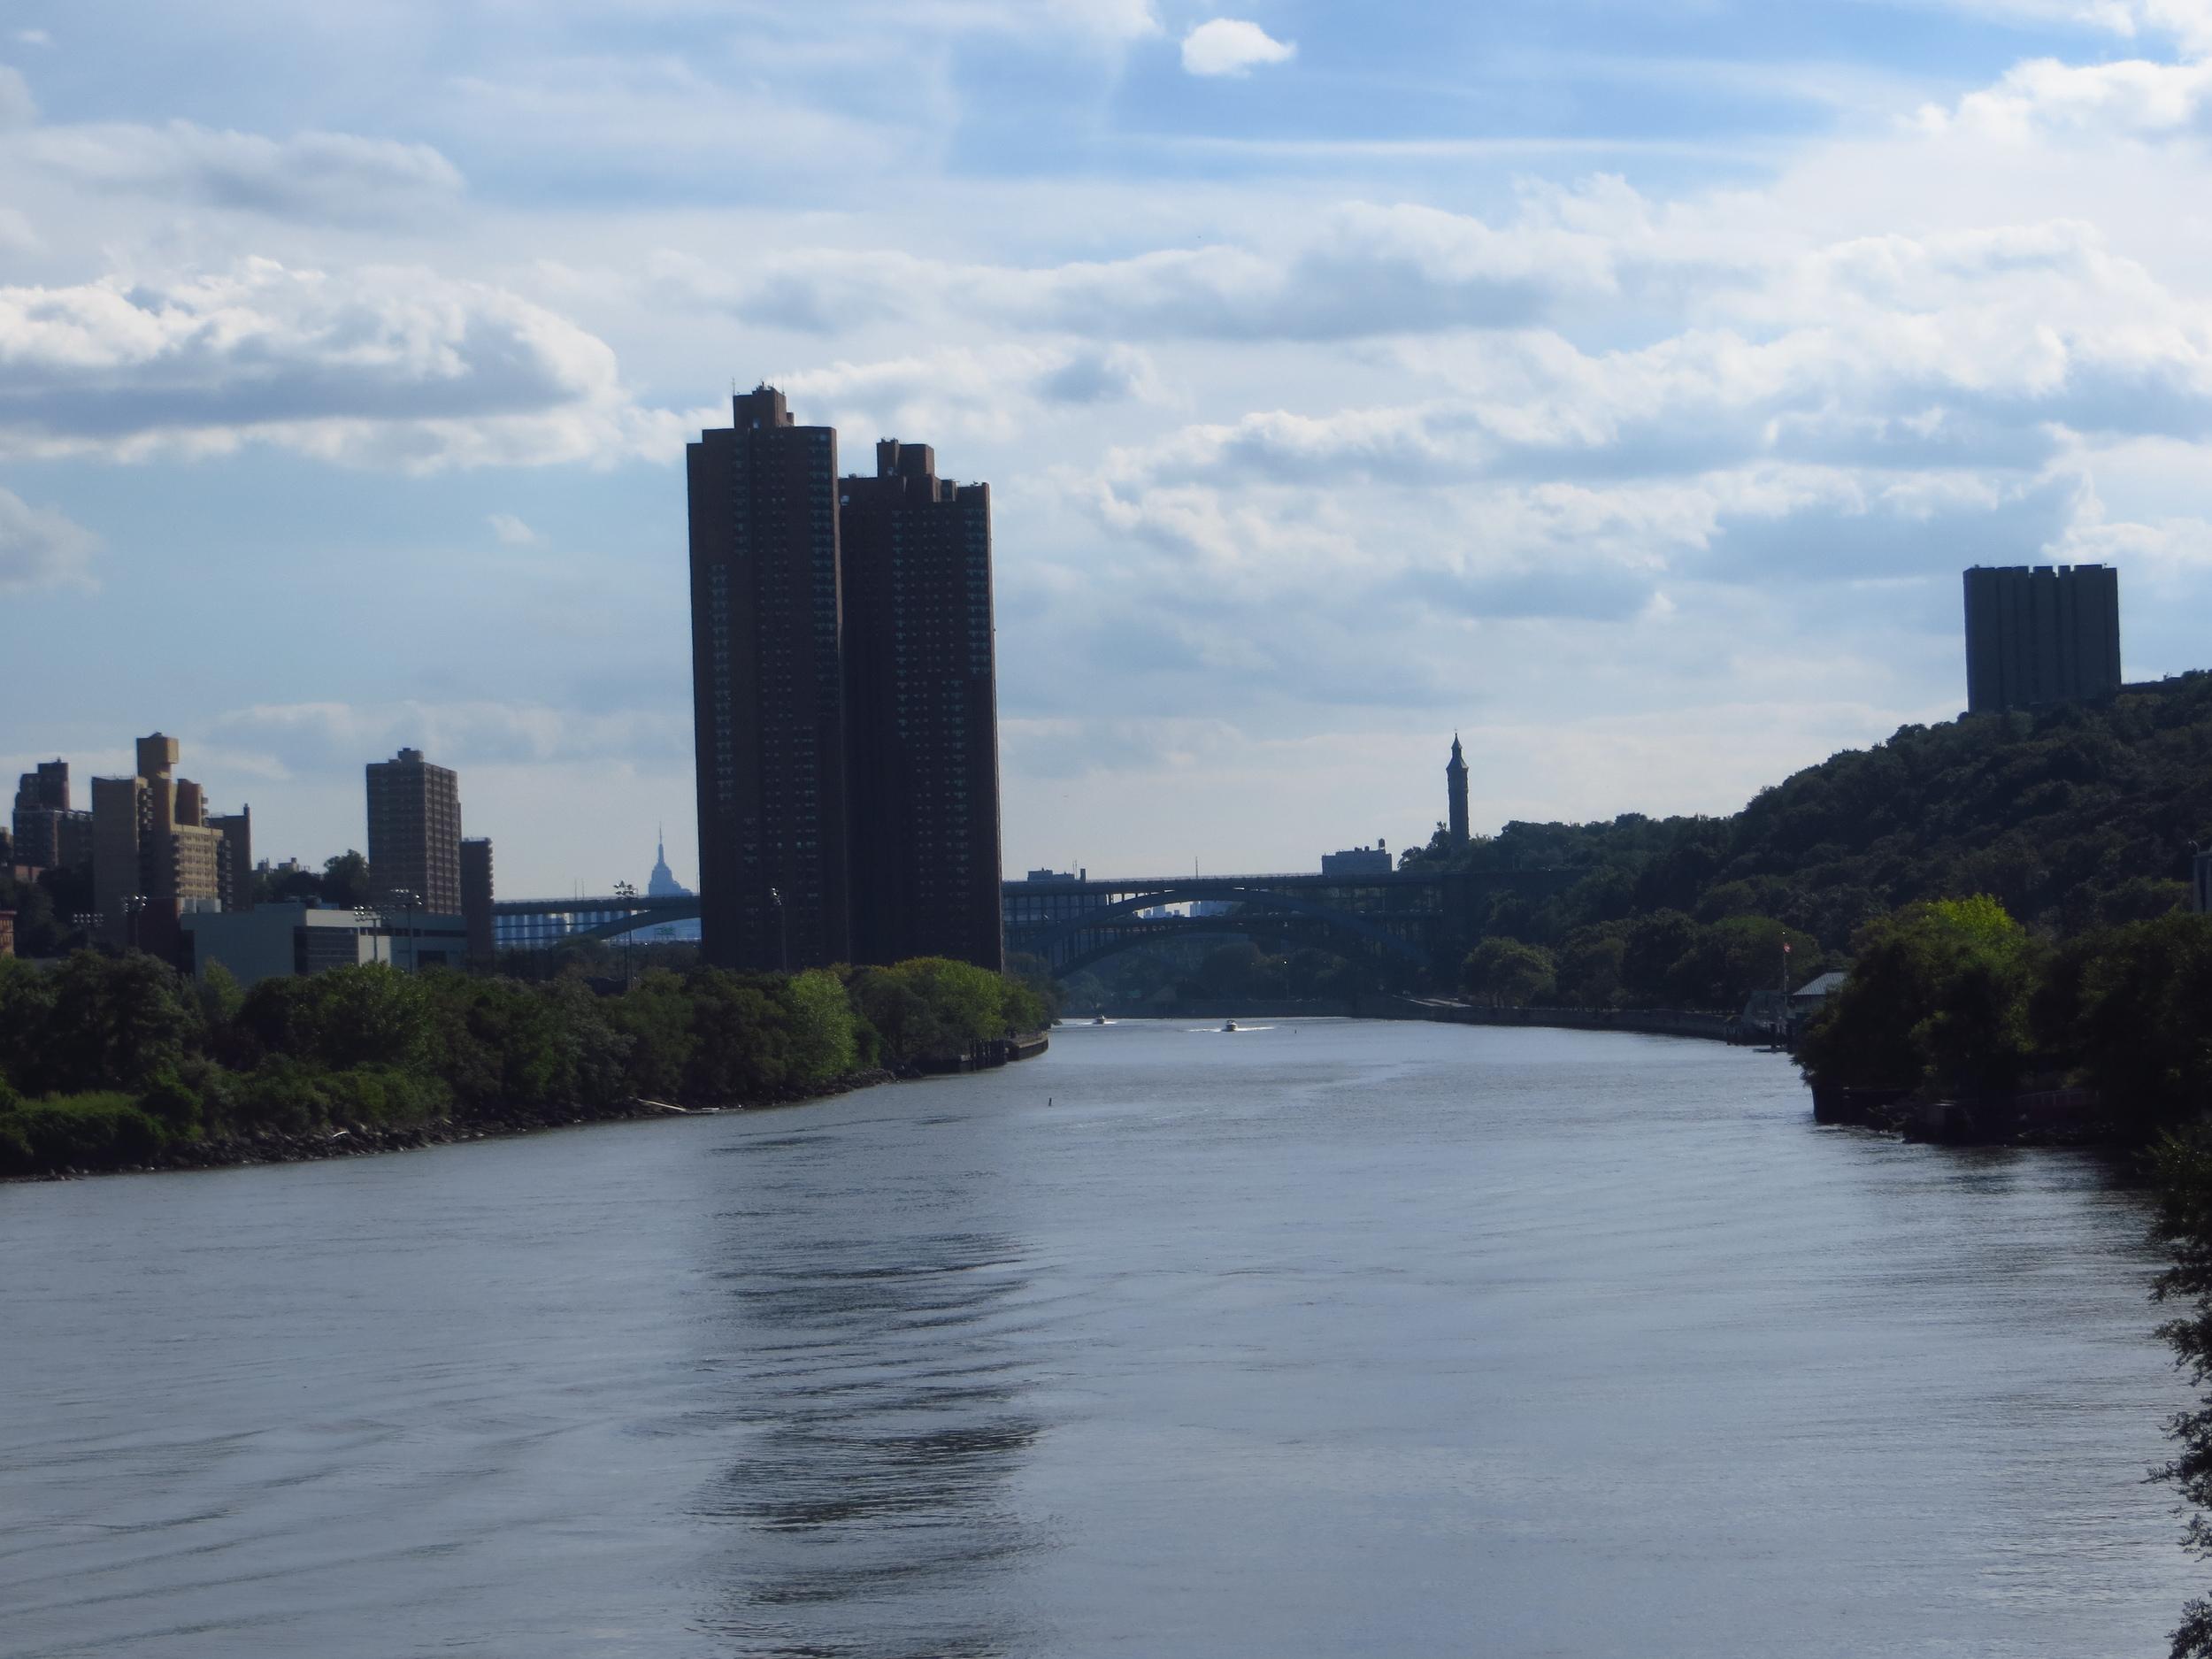 Harlem River looking south